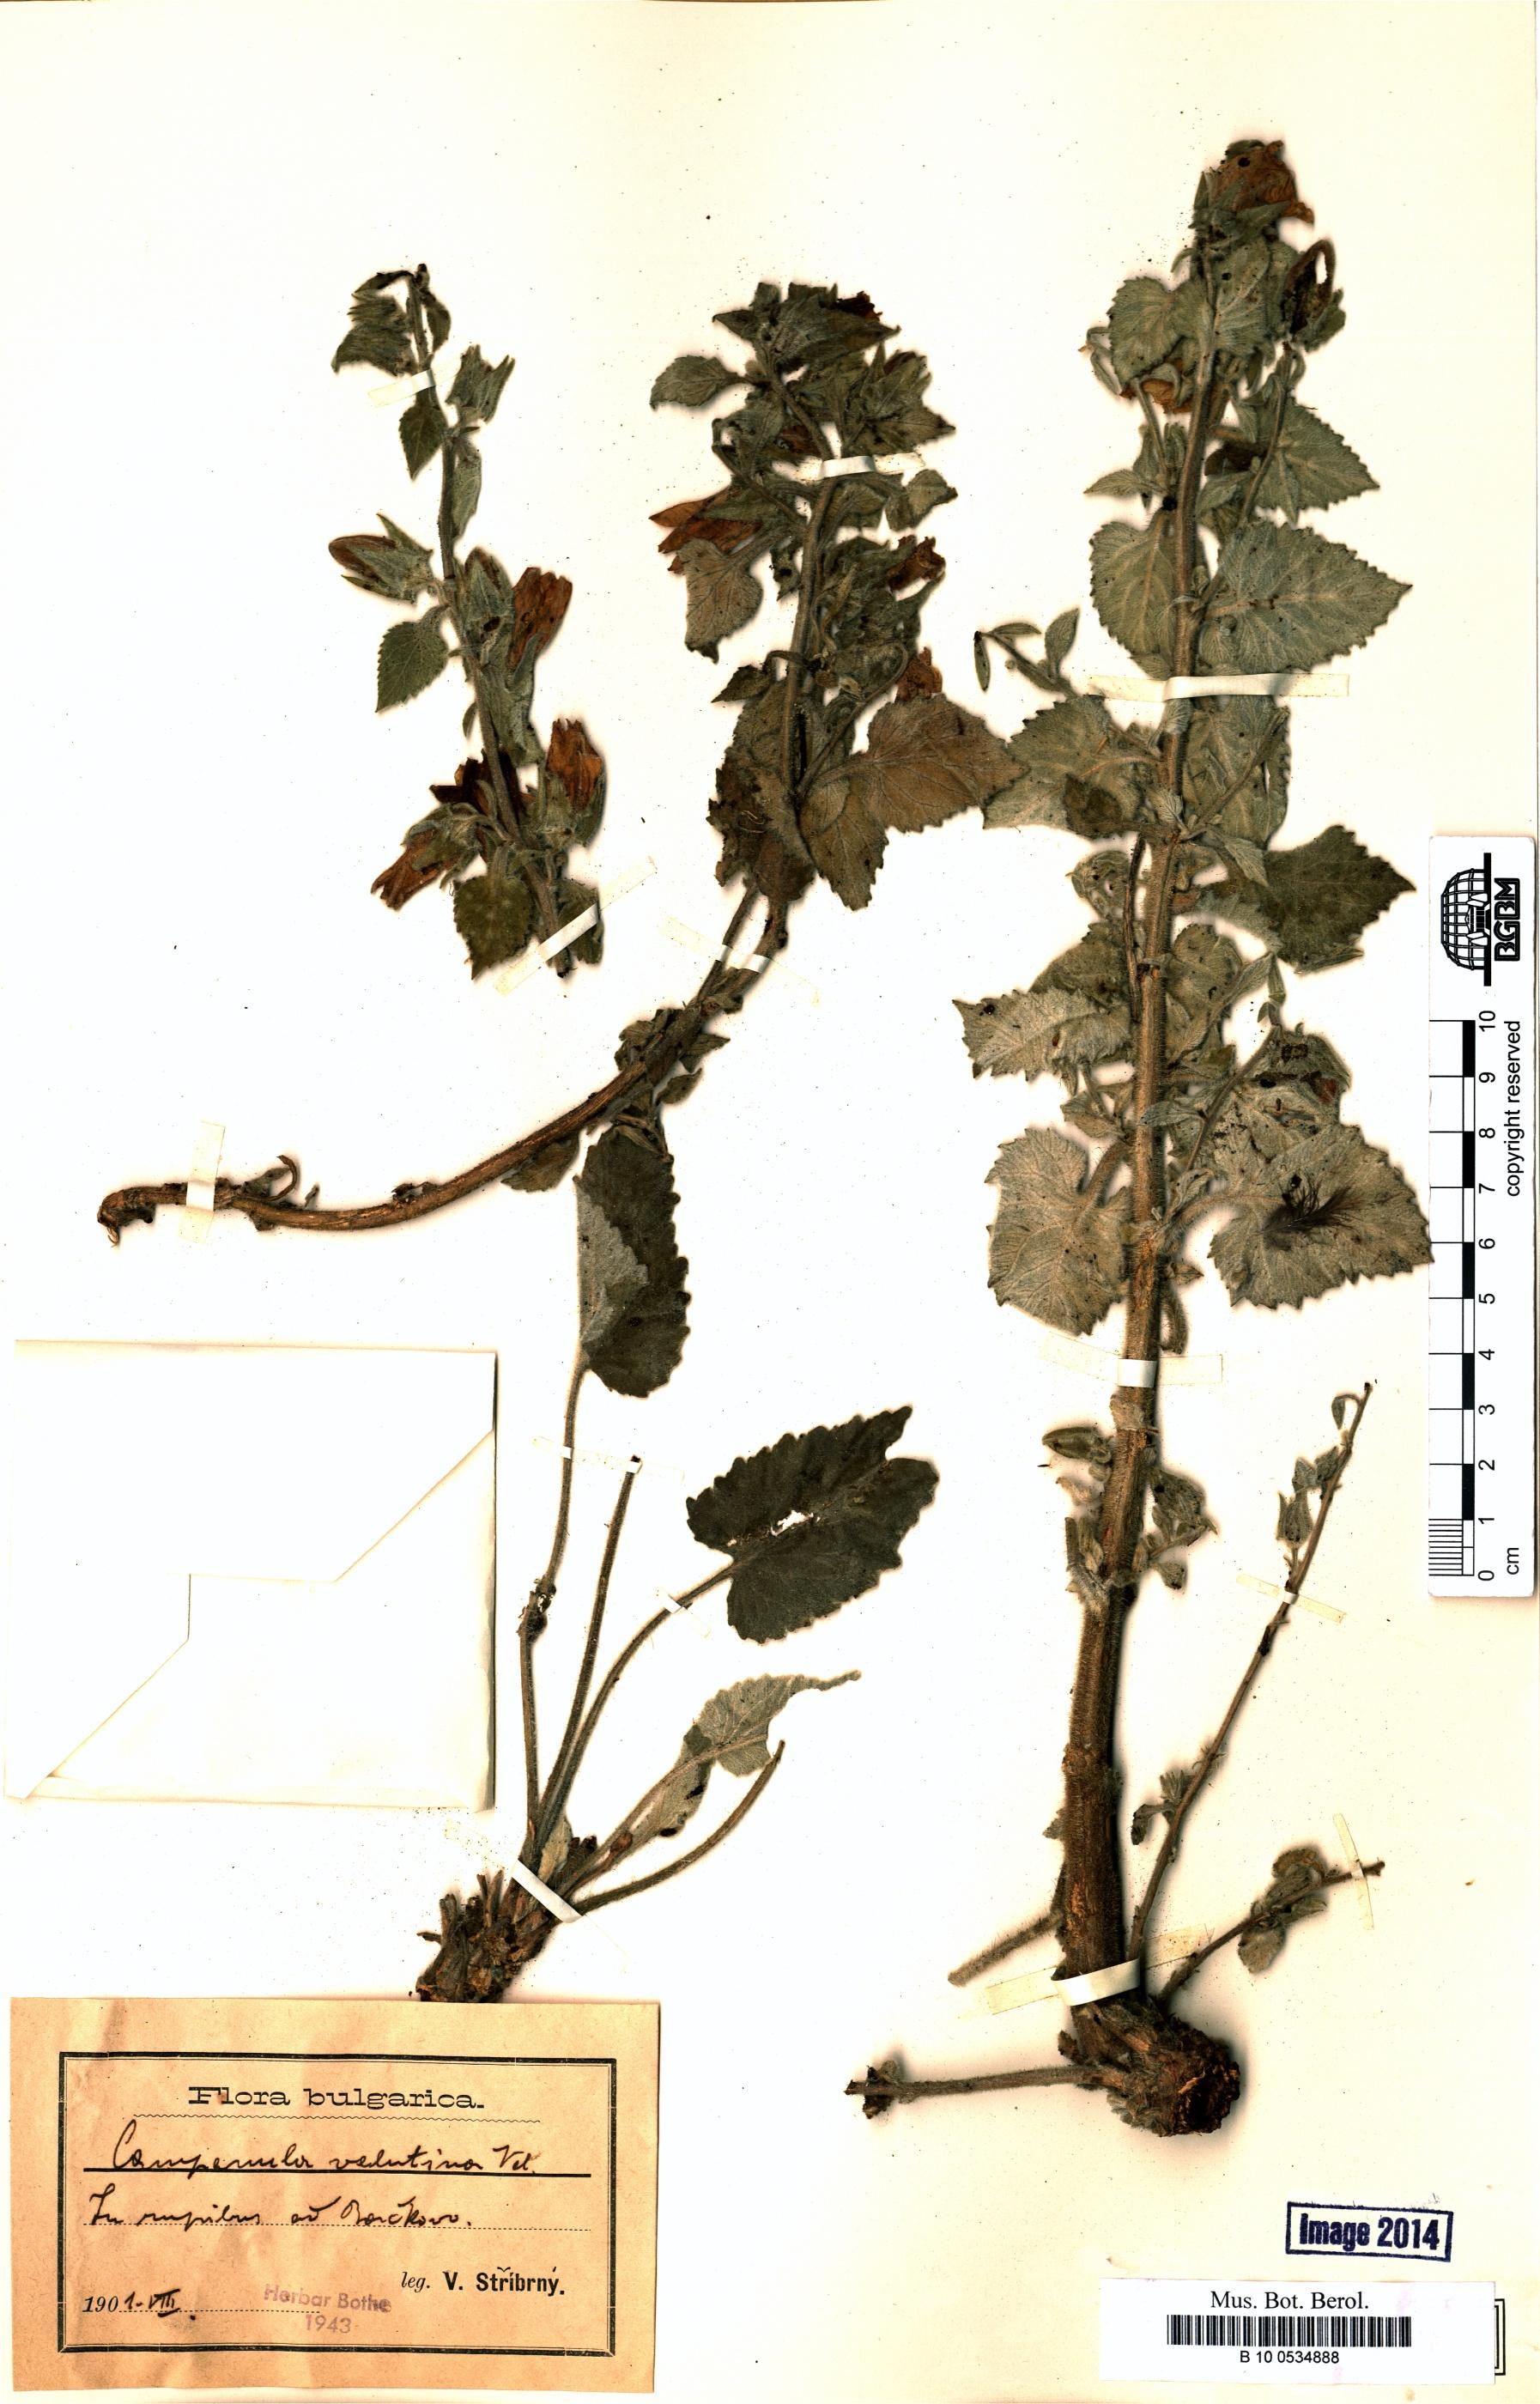 http://ww2.bgbm.org/herbarium/images/B/10/05/34/88/B_10_0534888.jpg